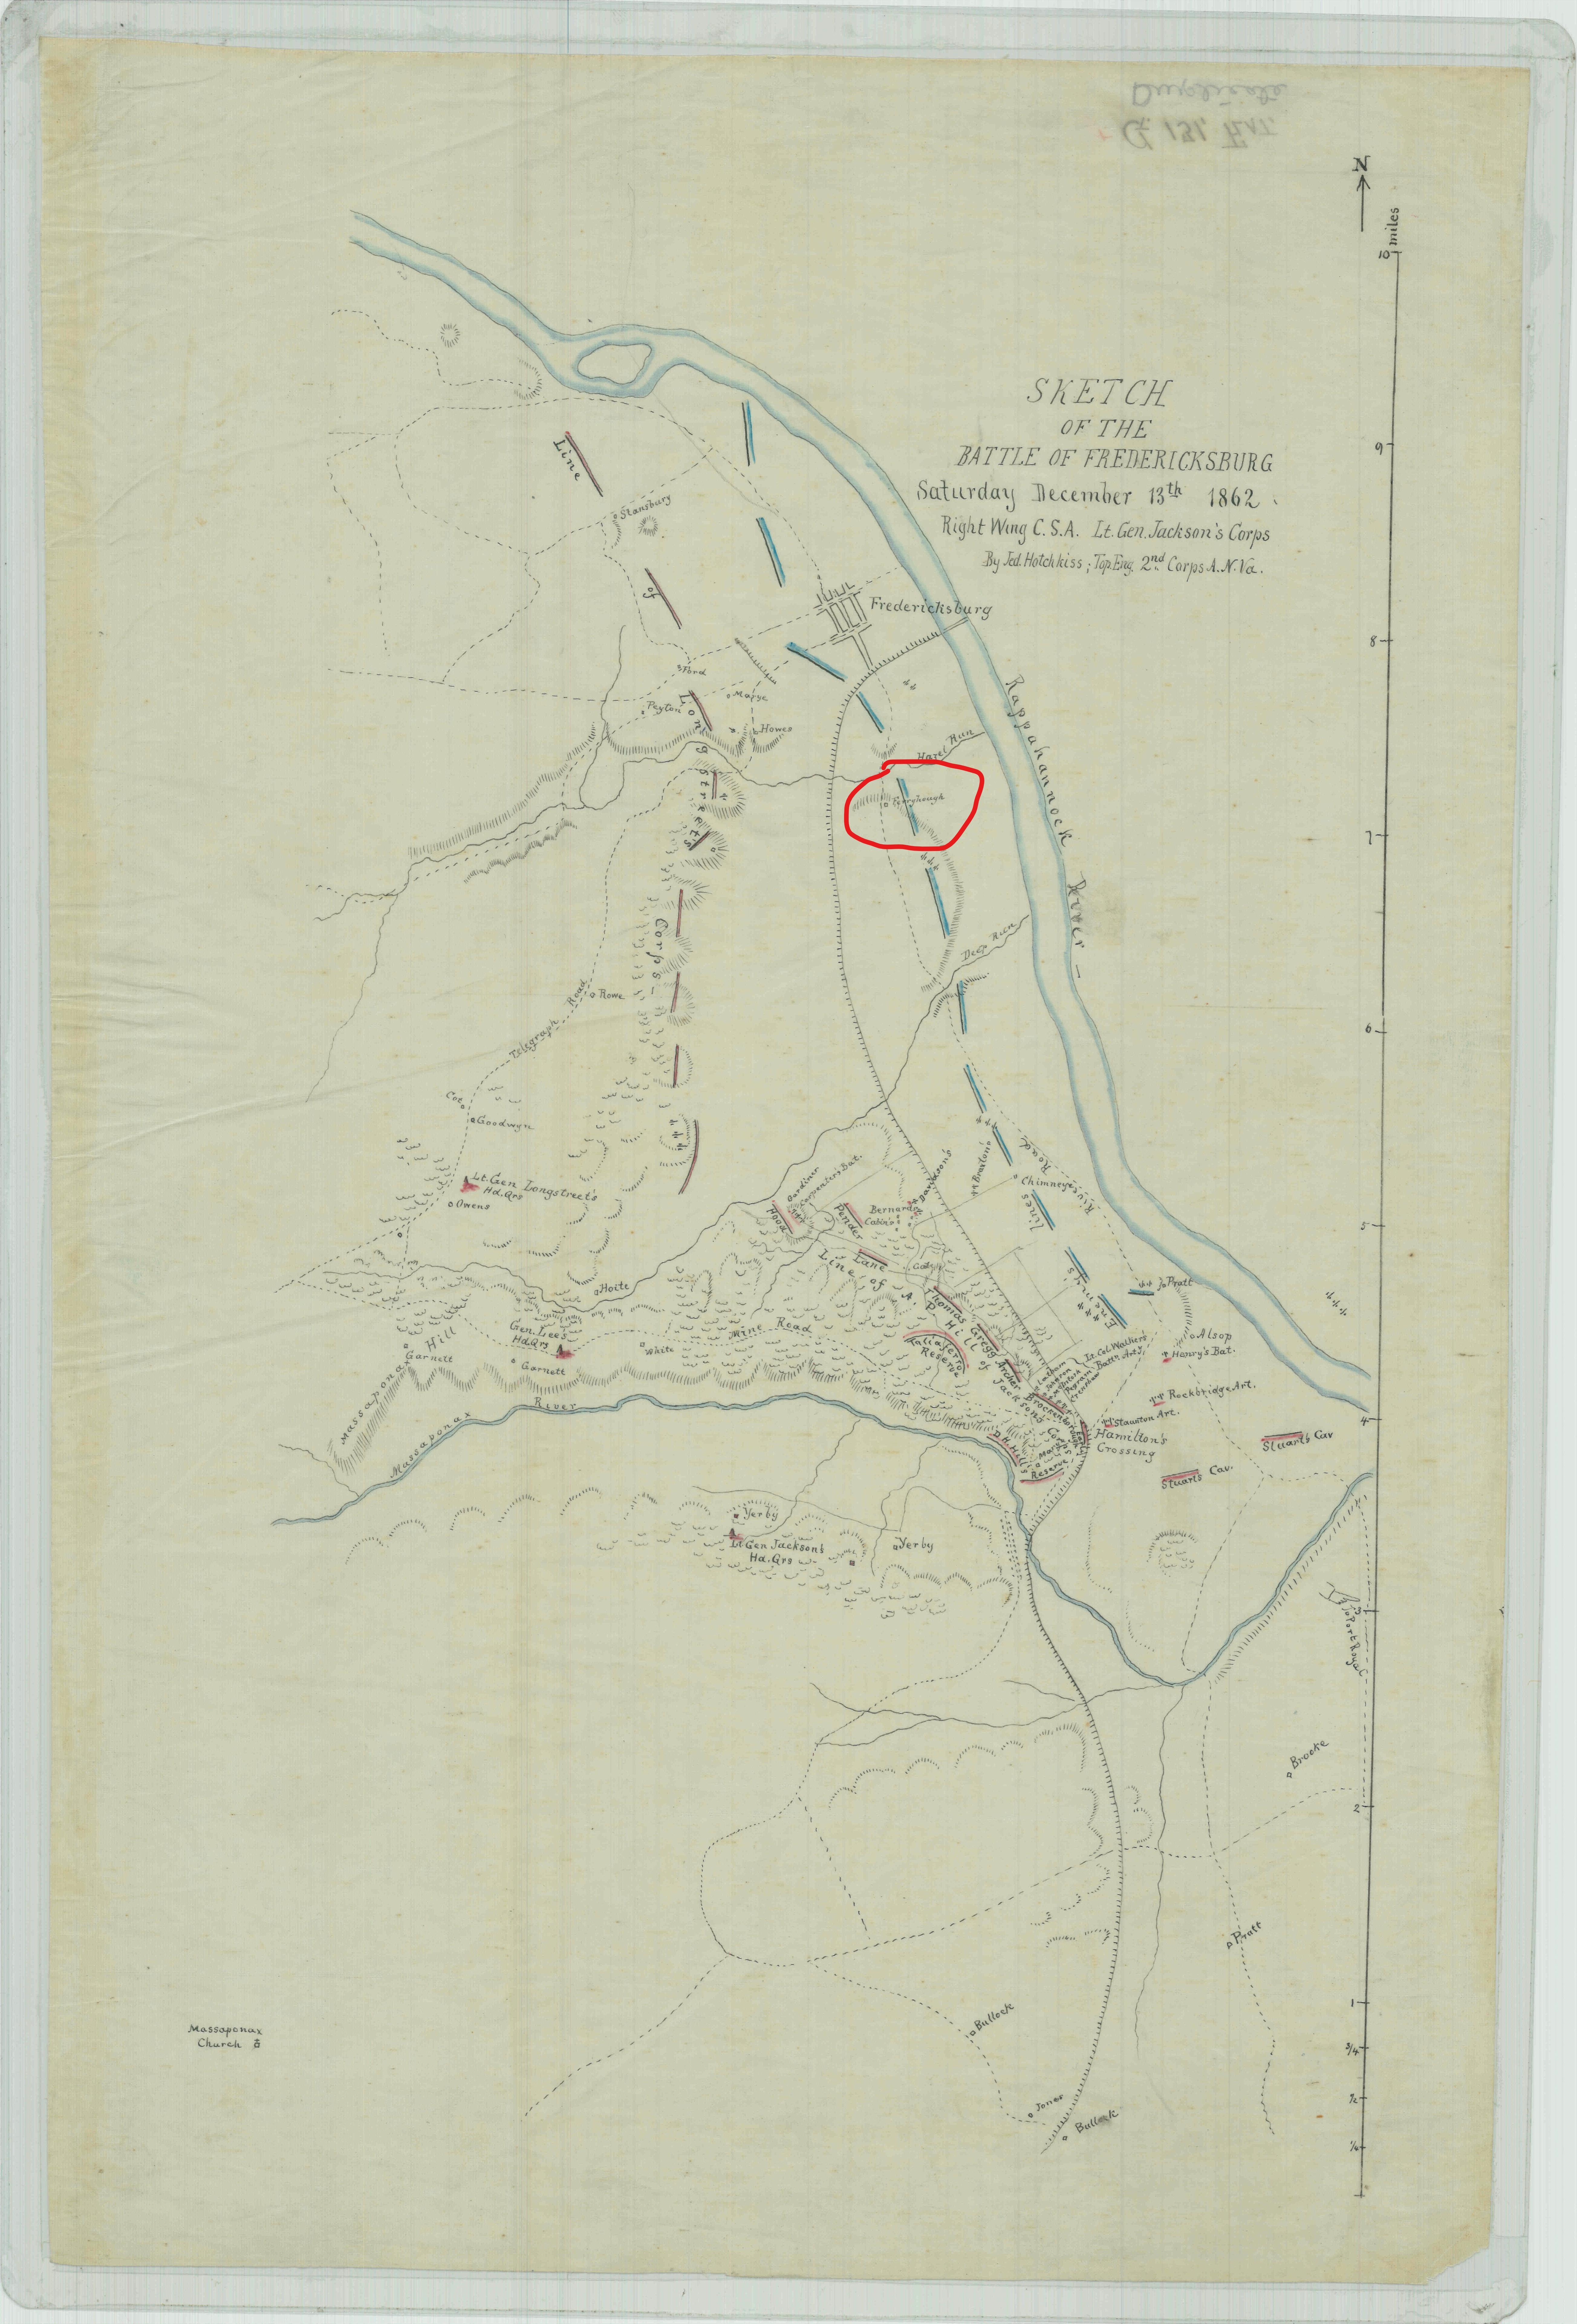 InkedSketch of the Battle of Fredericksburg_LI